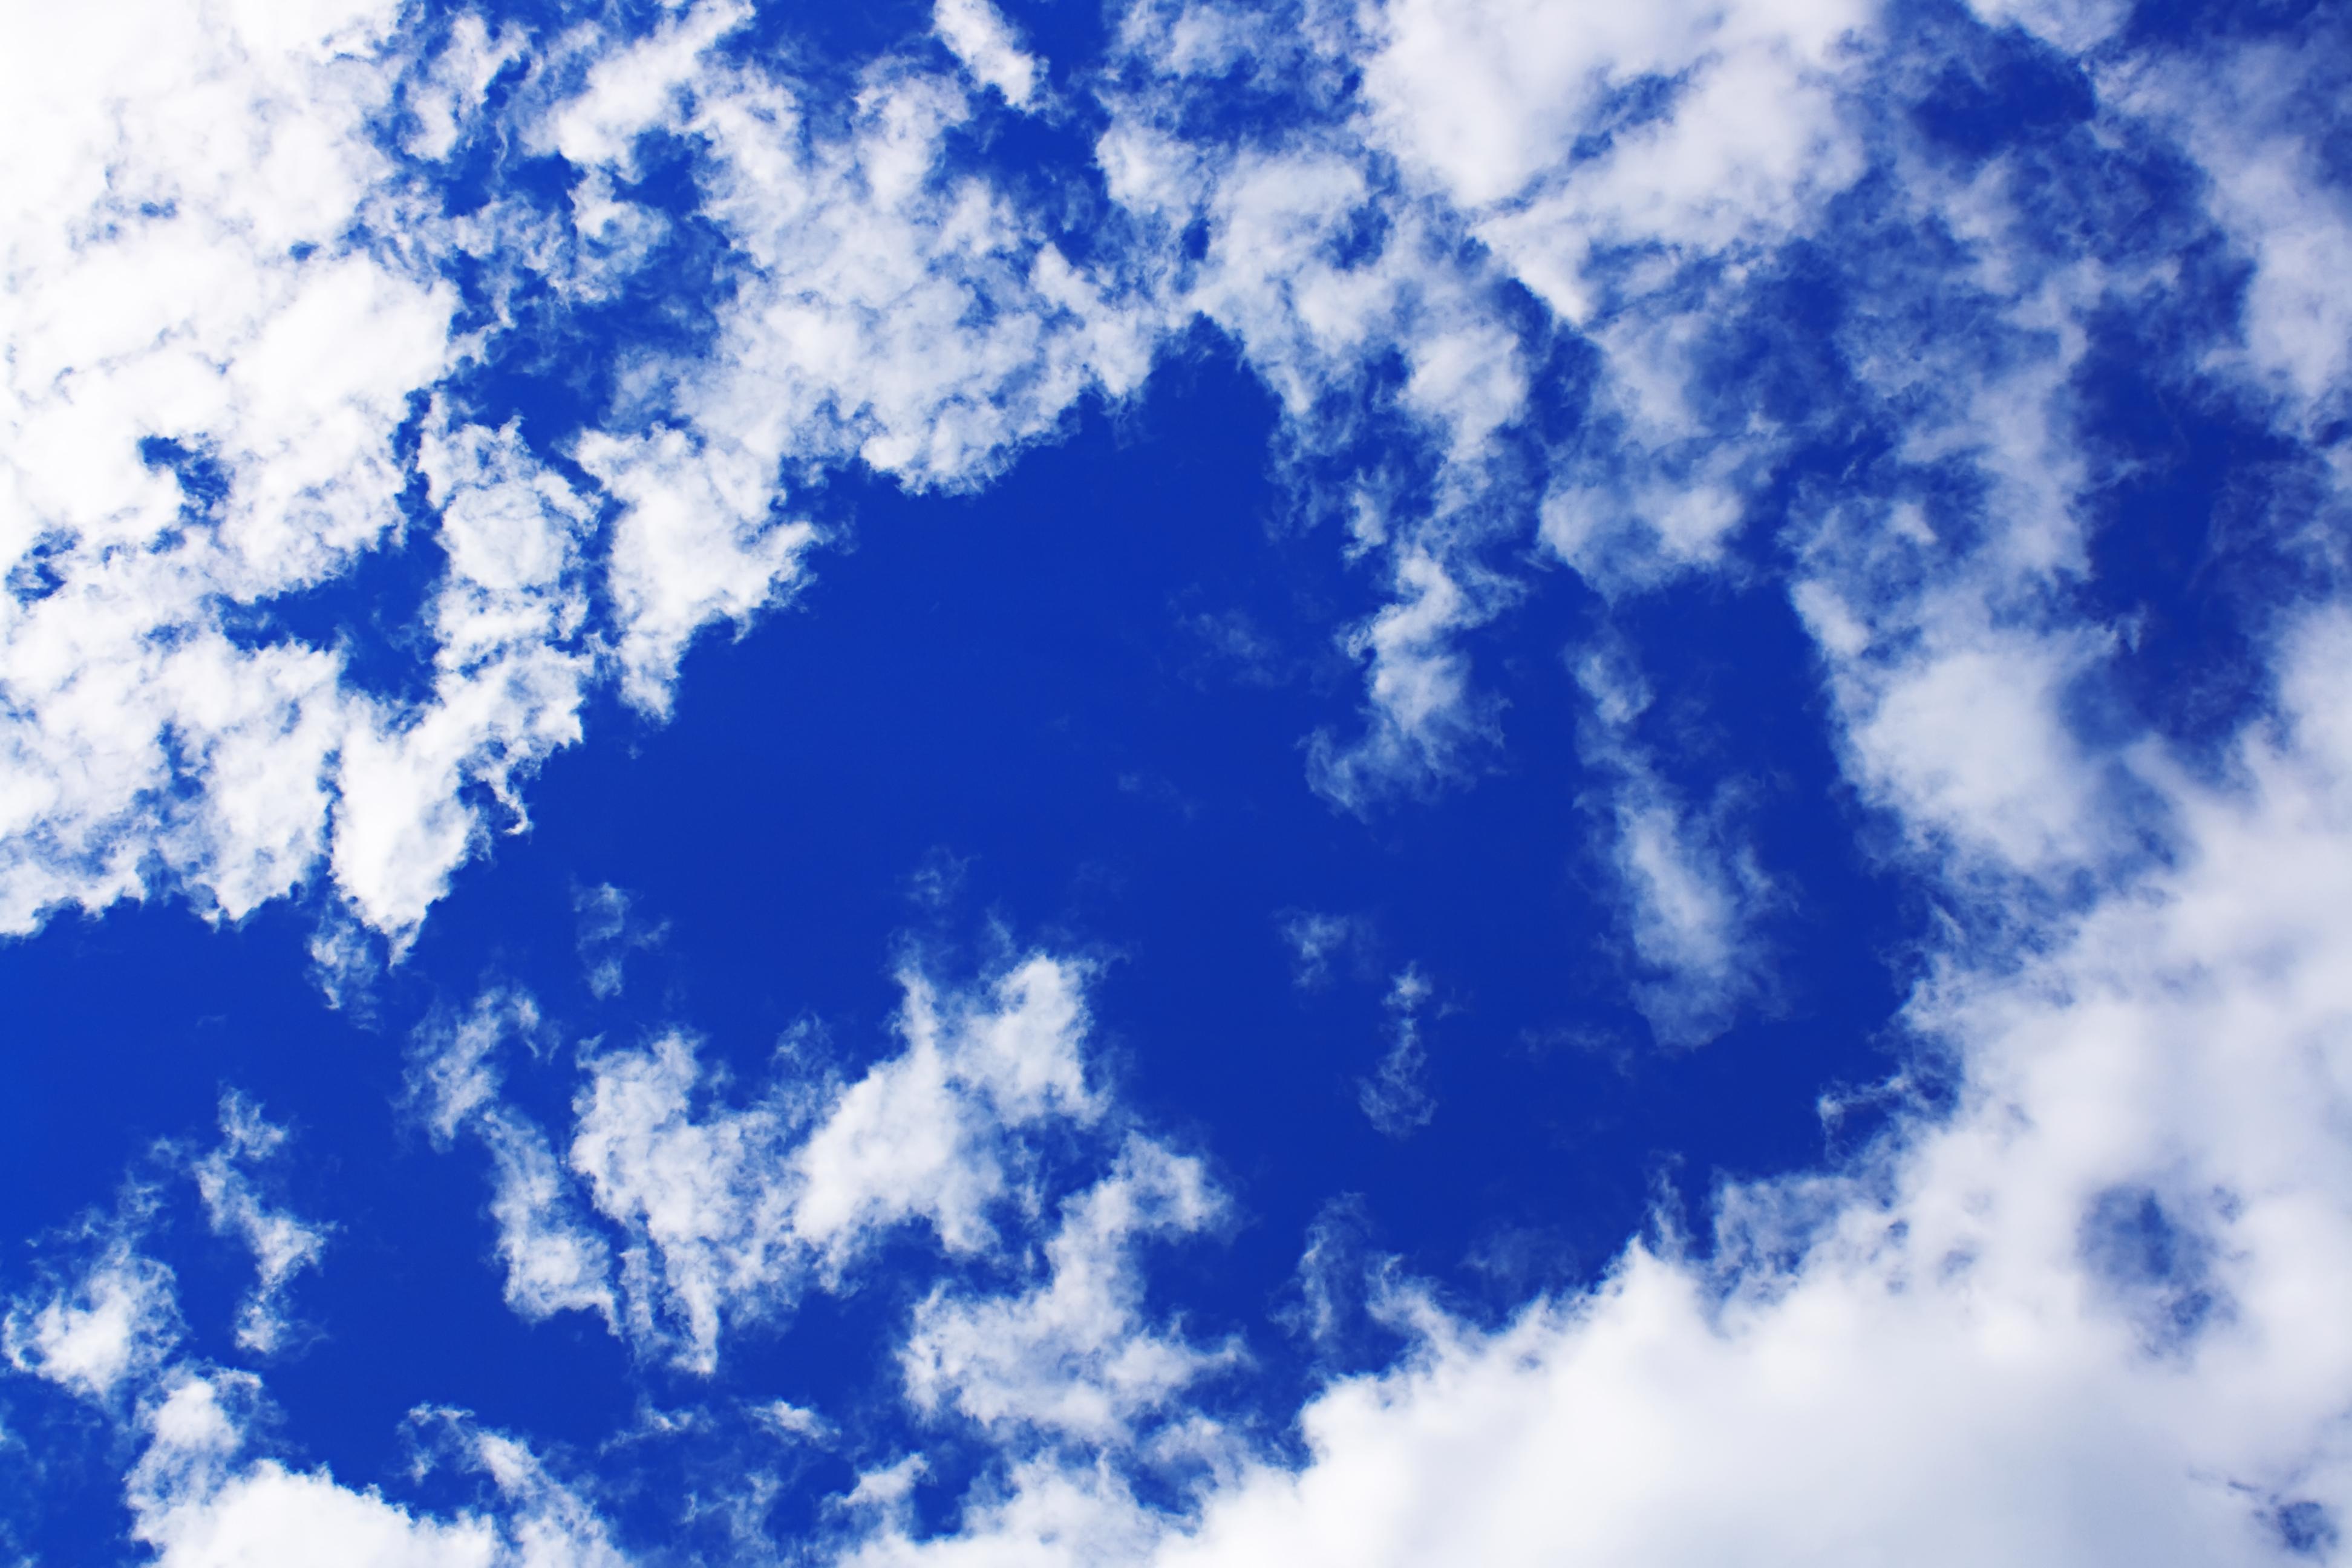 Sky, Overcast, Peace, Outdoors, Photo, HQ Photo